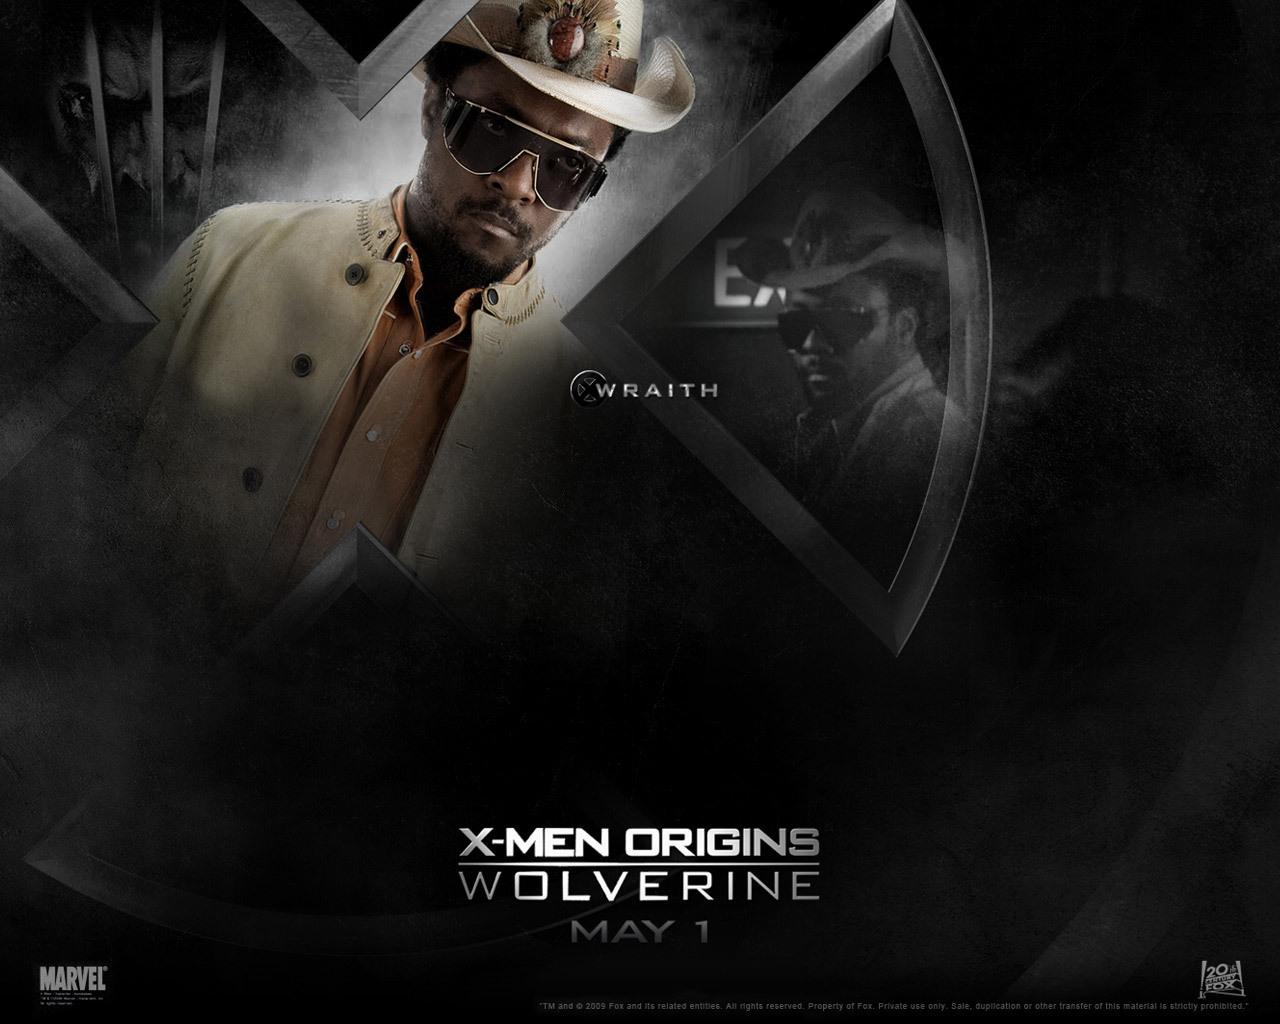 Men Origins Wolverine images Wolverine  wallpaper photos 5946888 1280x1024